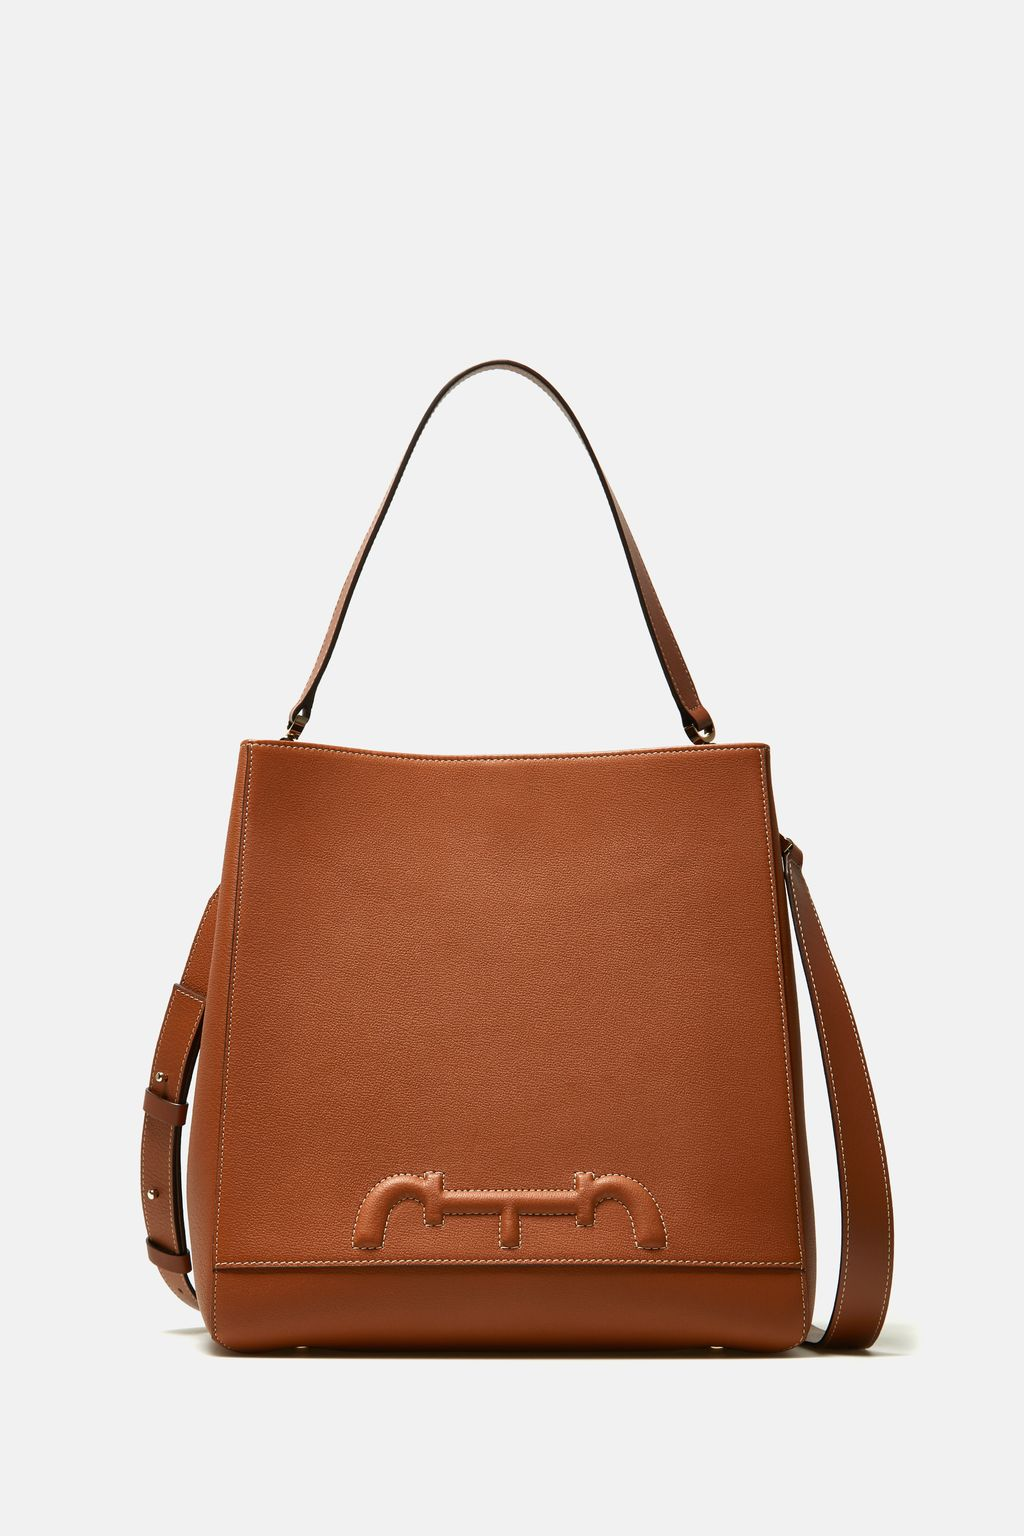 Doma Insignia Hobo | Medium shoulder bag